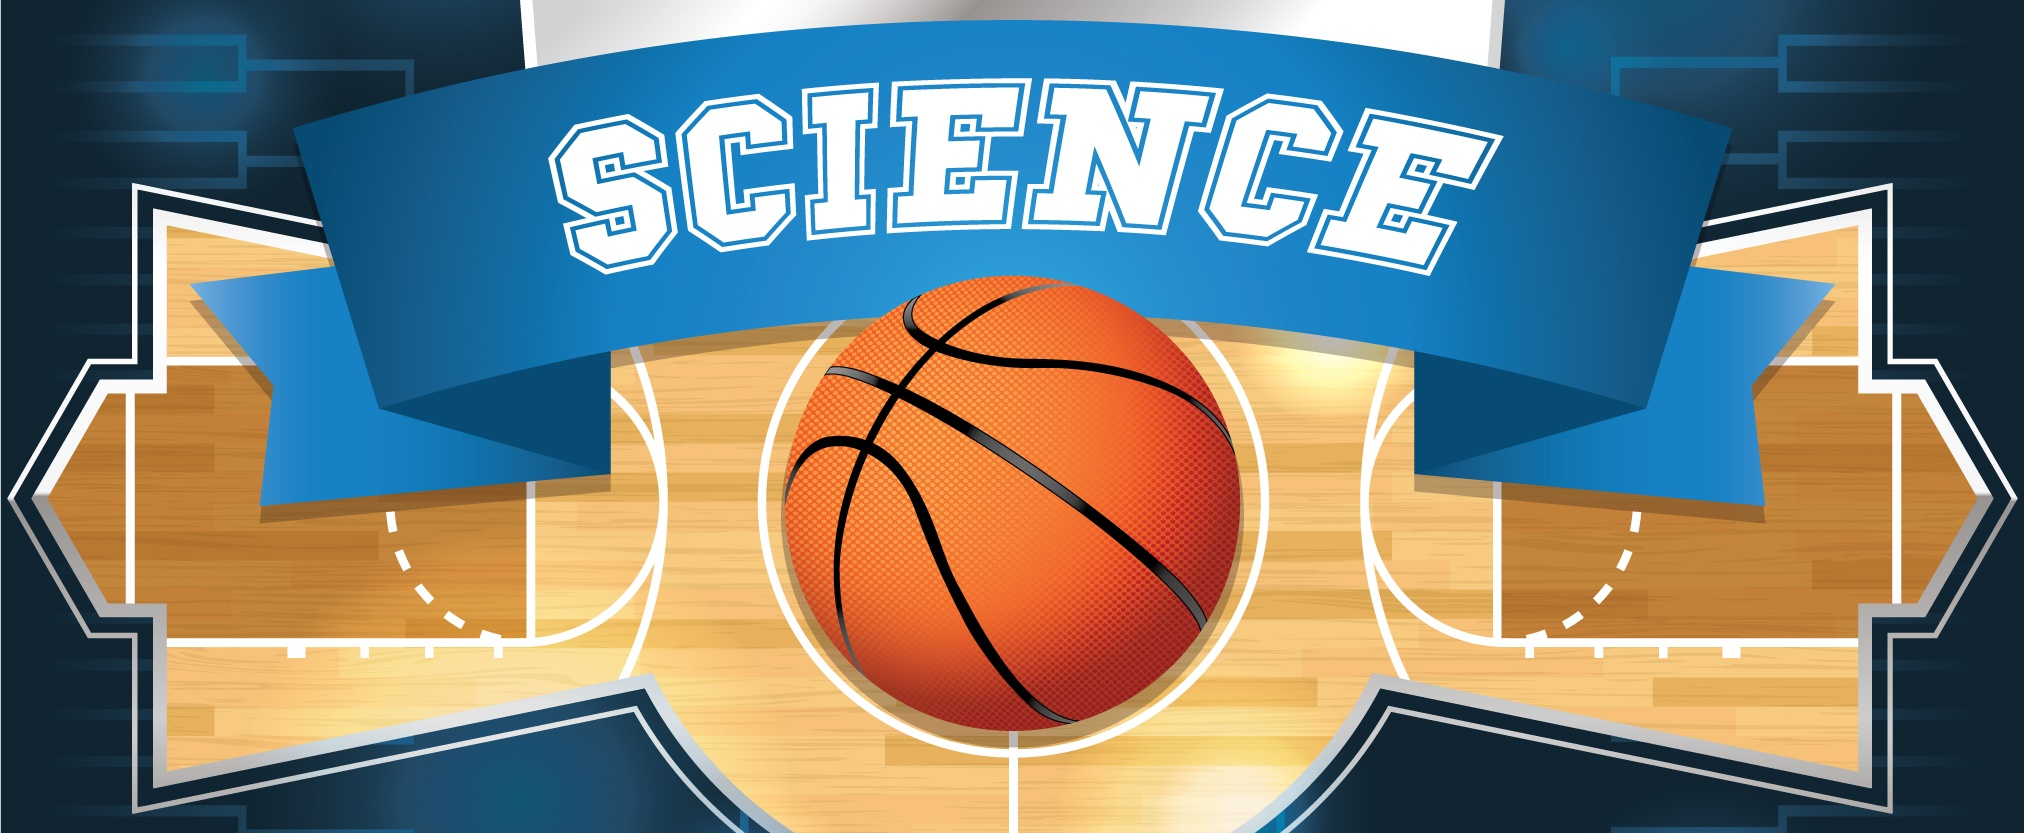 Science-Basketball-2024-0318